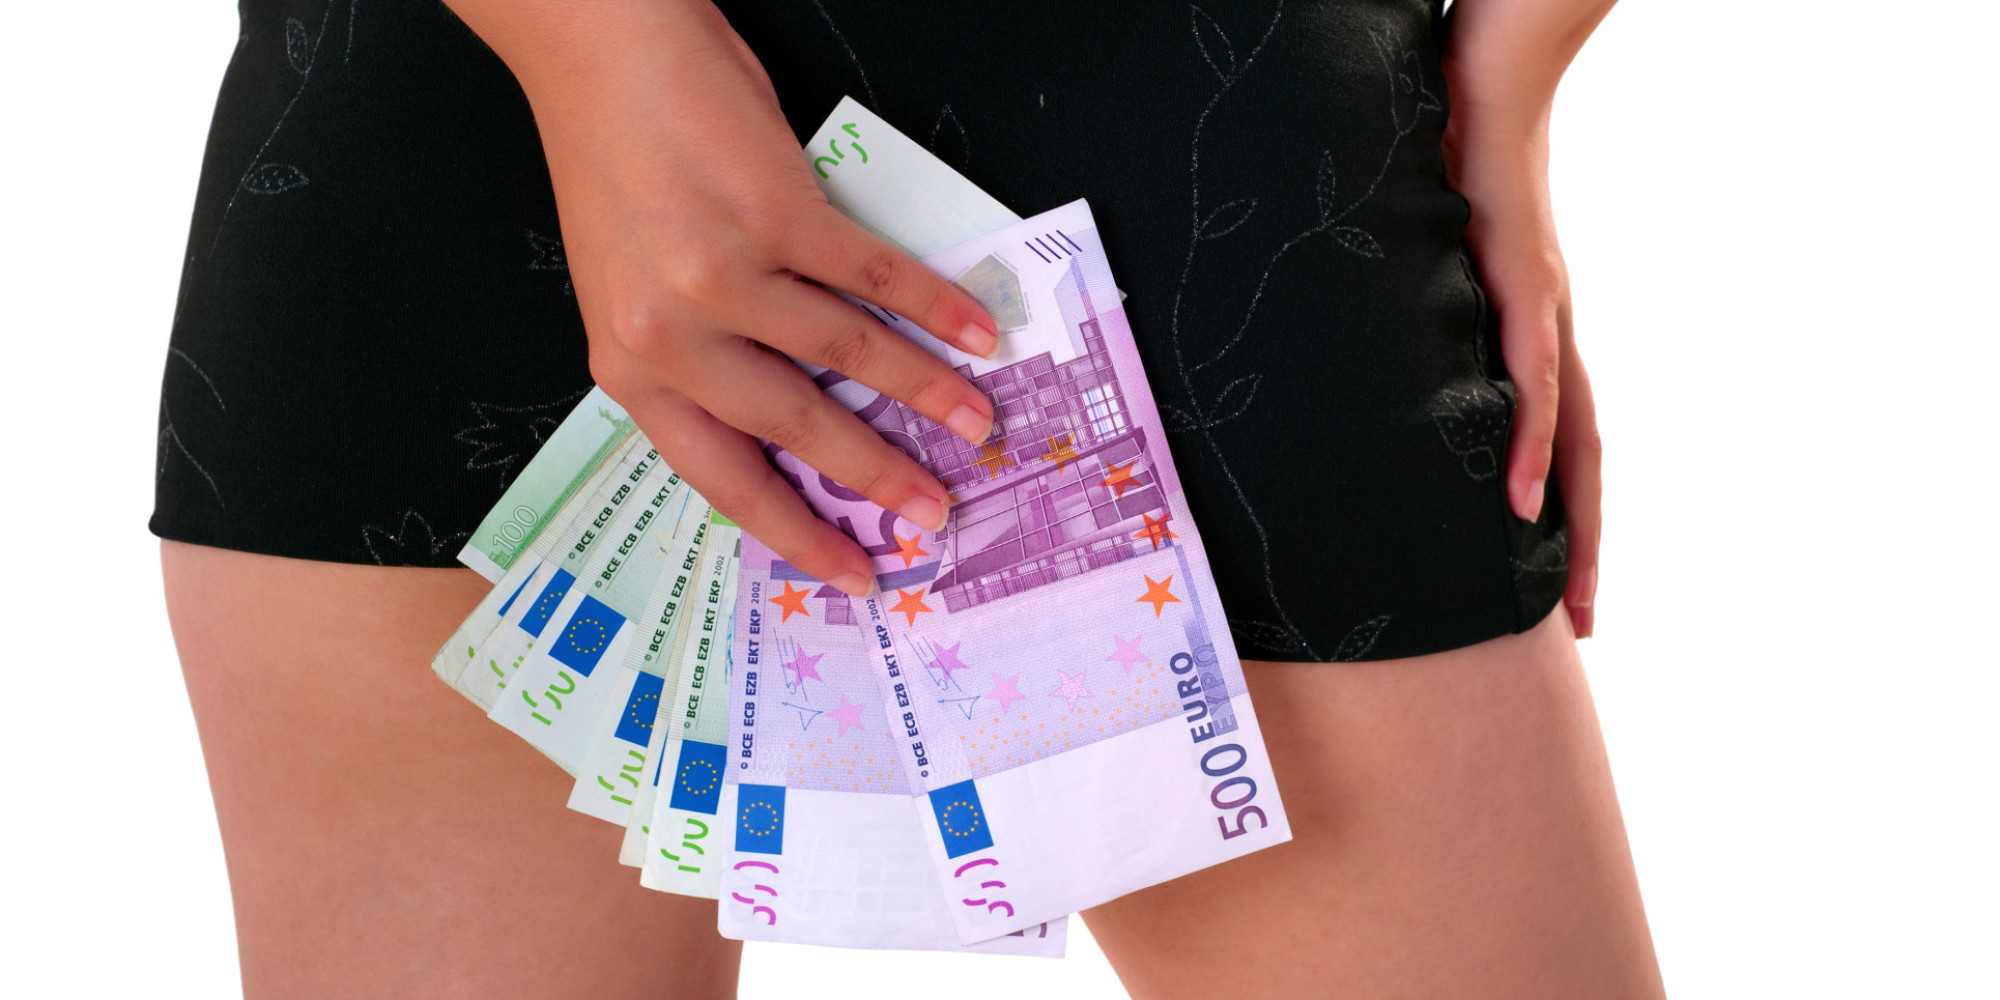 prostitutas torrejon perfil de las prostitutas en españa